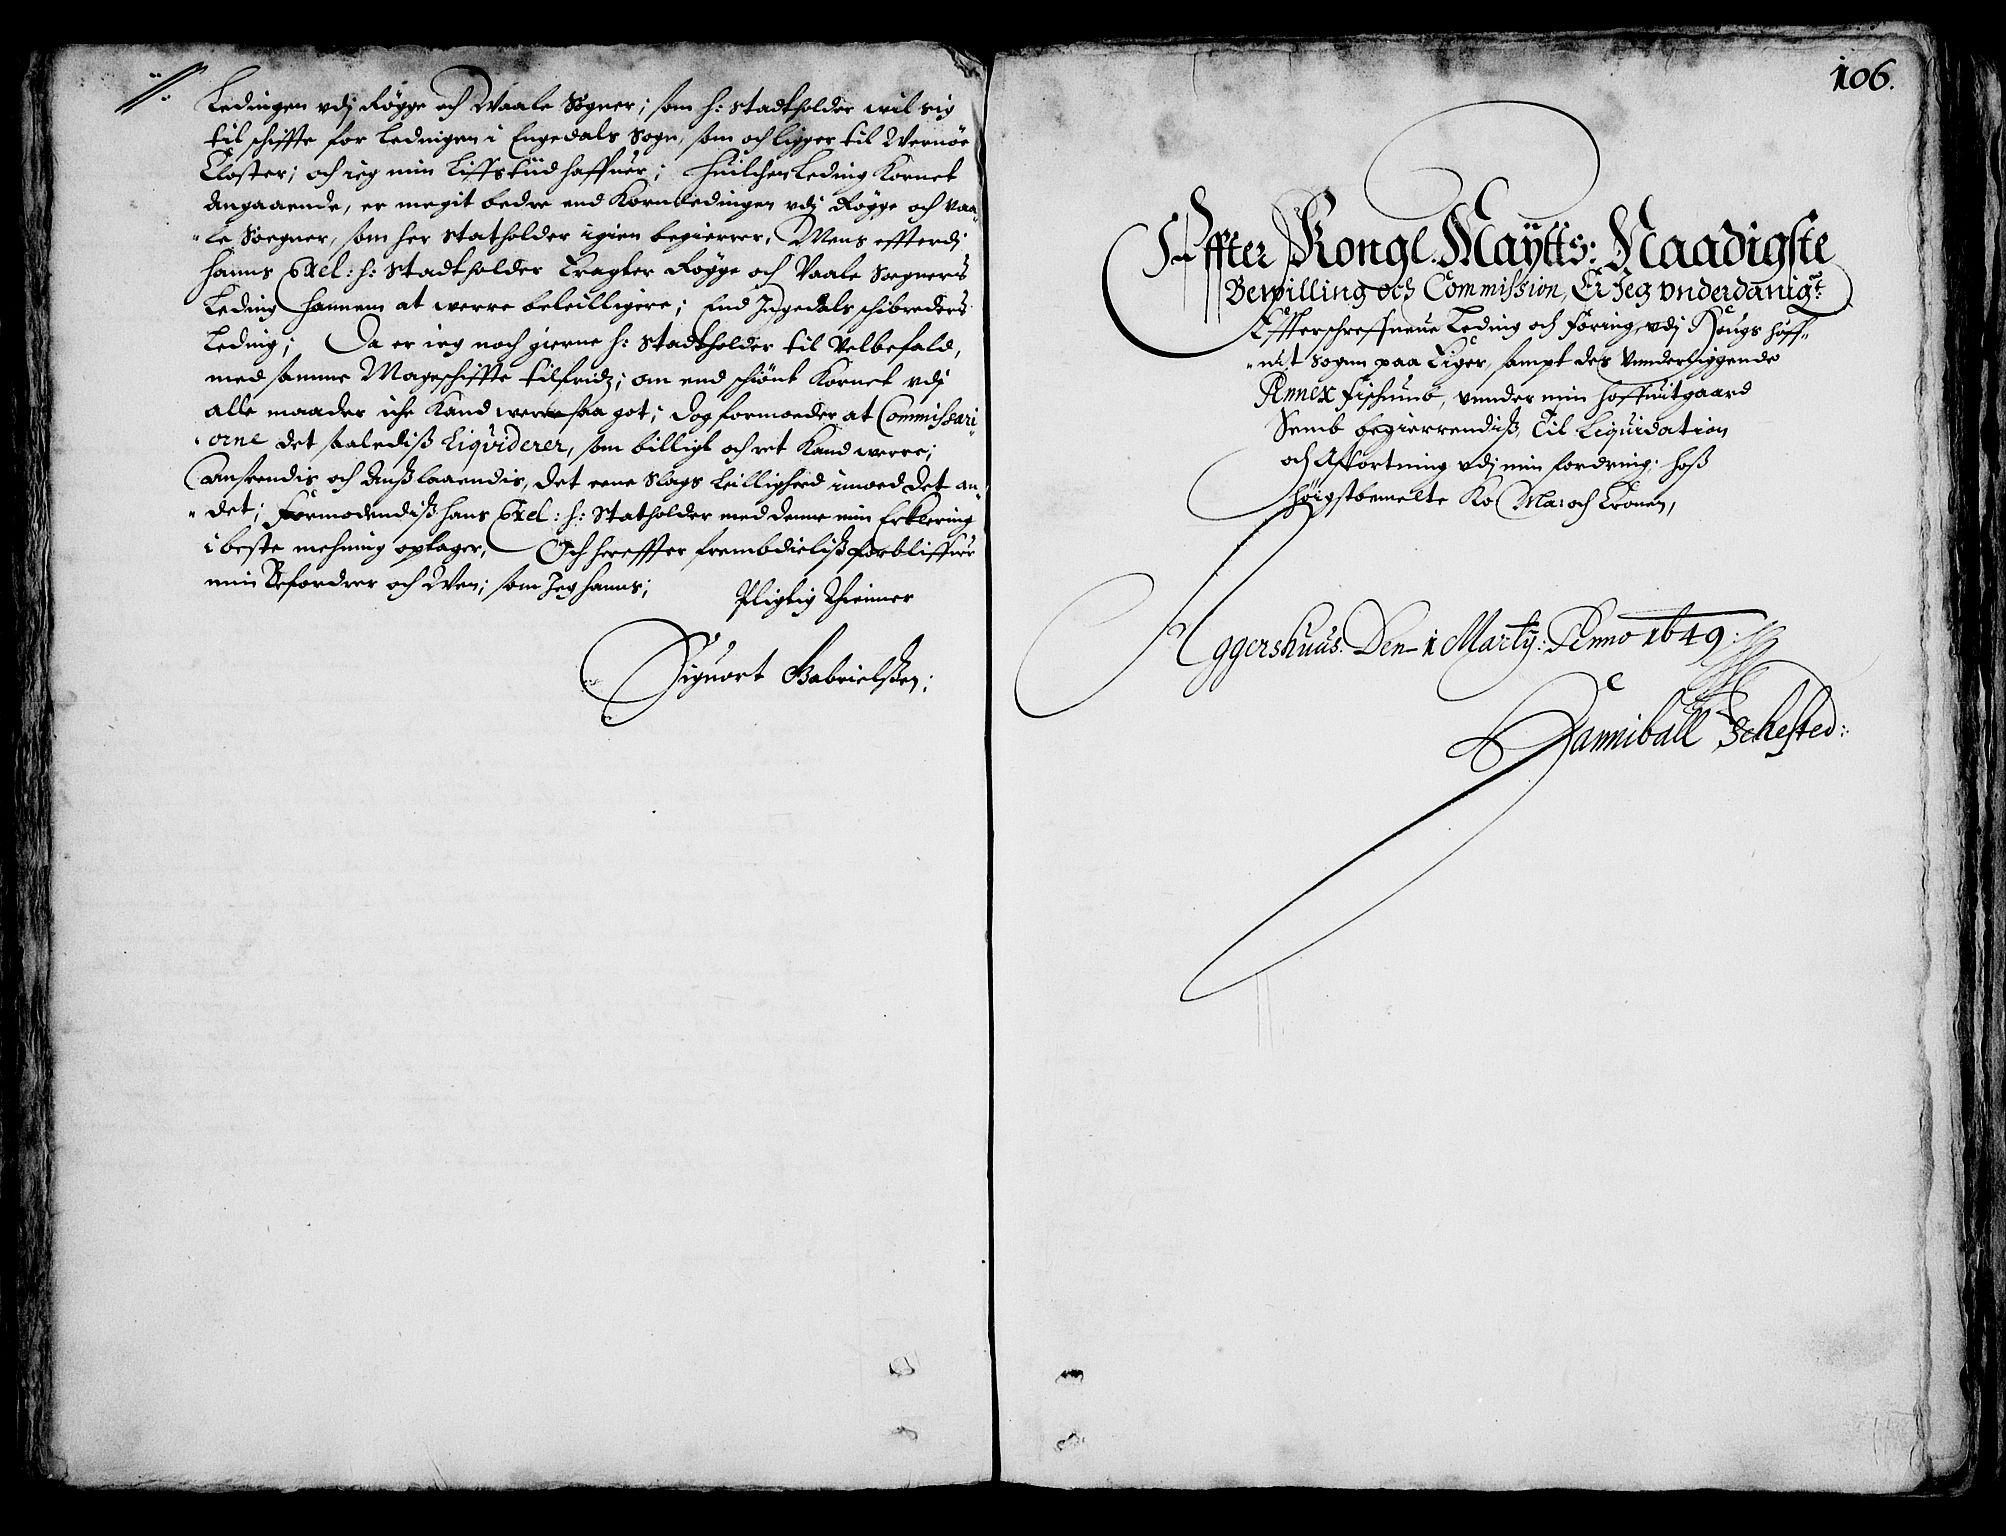 RA, Rentekammeret inntil 1814, Realistisk ordnet avdeling, On/L0001: Statens gods, 1651, s. 105b-106a